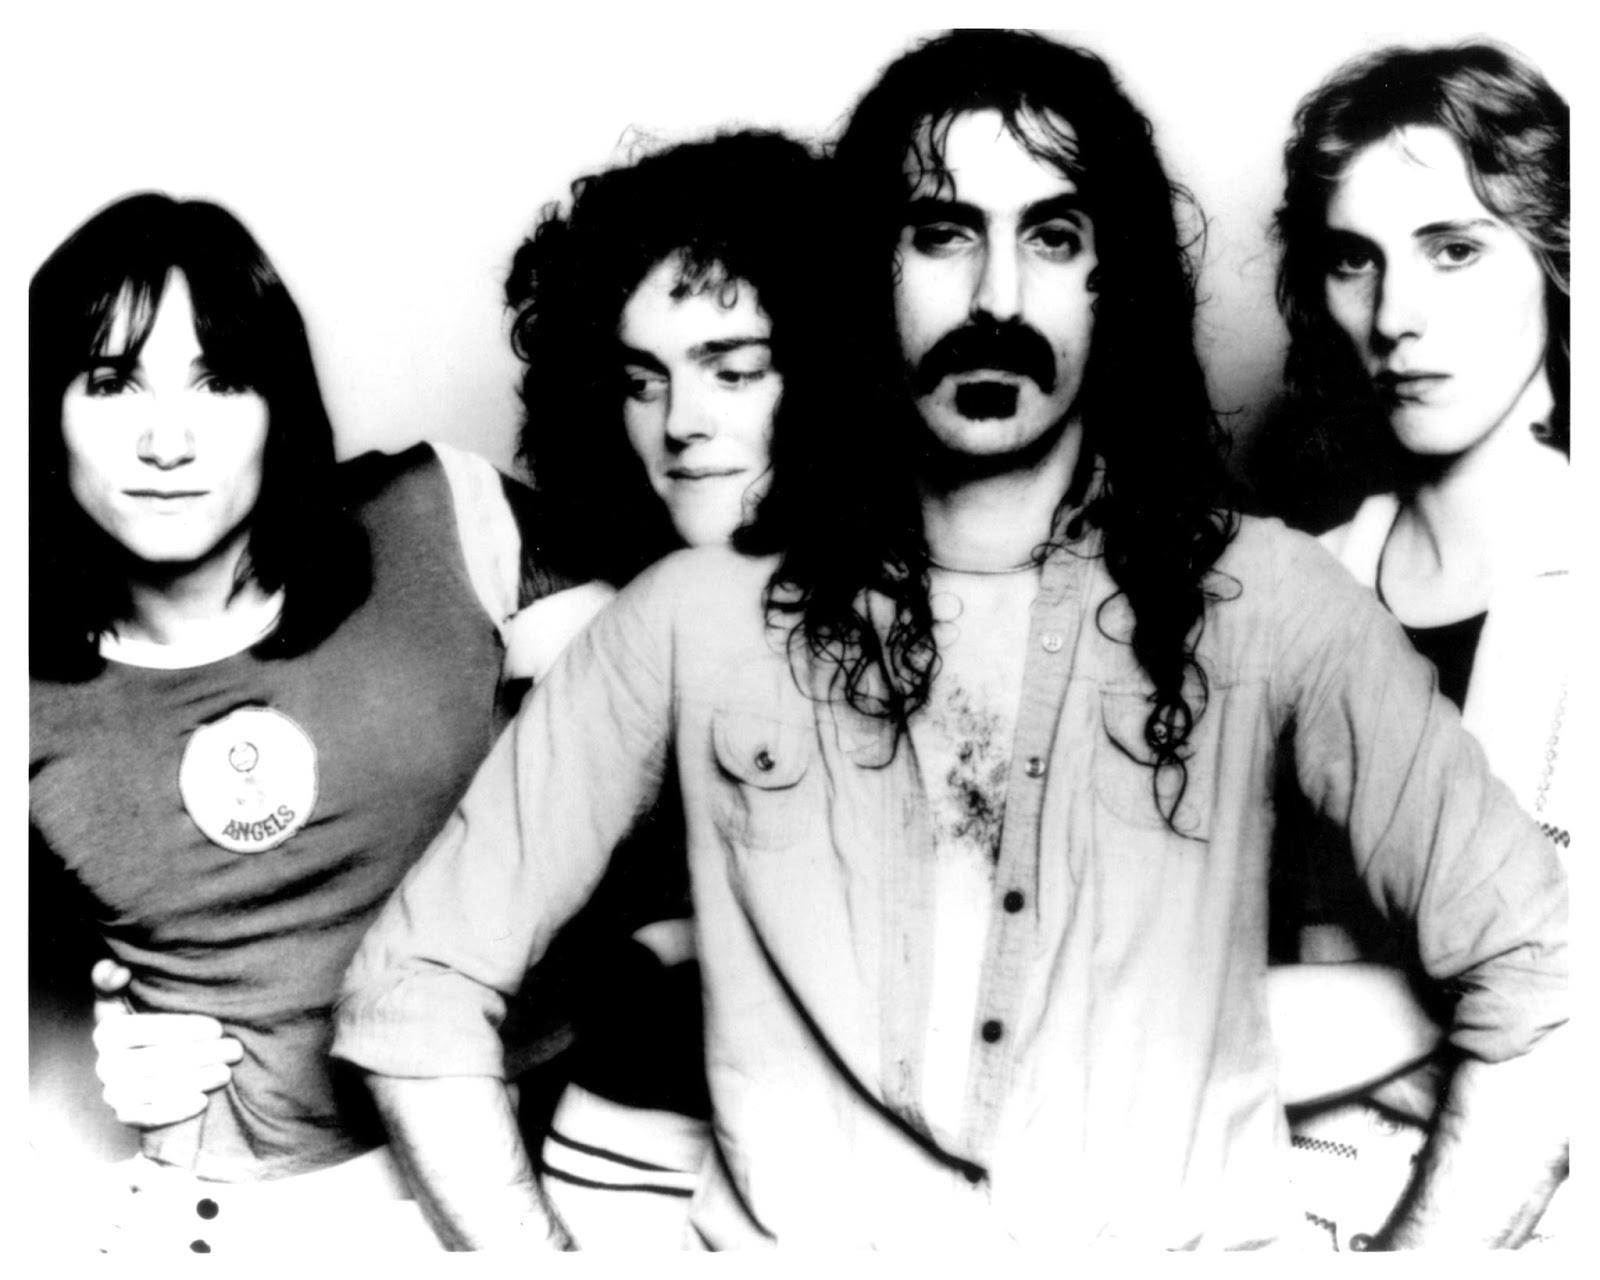 Frank Zappa Happy Birthday with happy birthday to eddie jobson – april 28, 1955 – timh | eleven